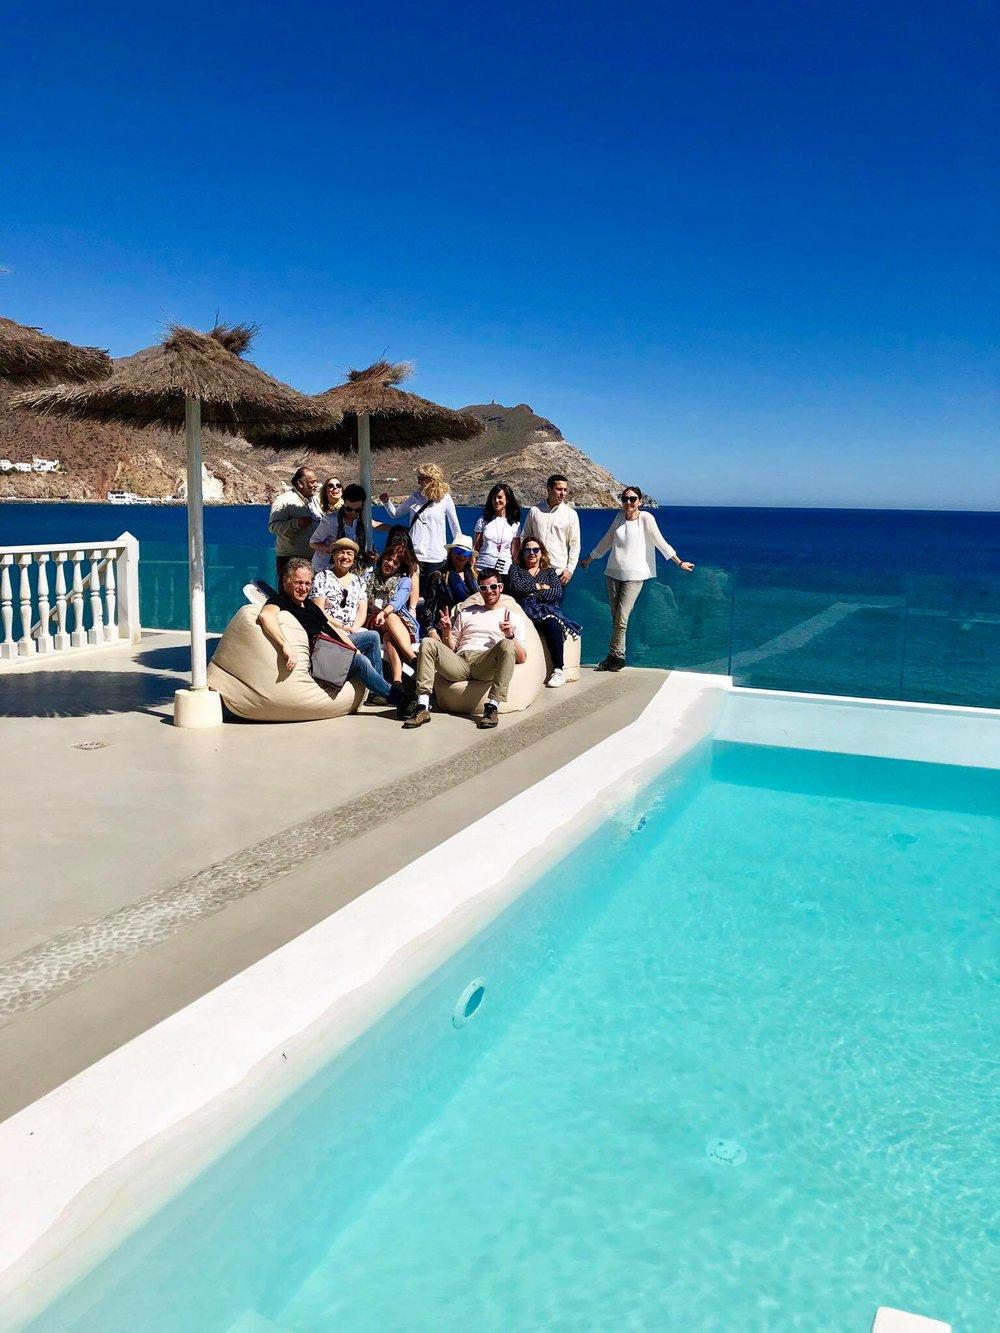 Kach Solo Travels in 2019 Spain you're so beautiful21.jpg